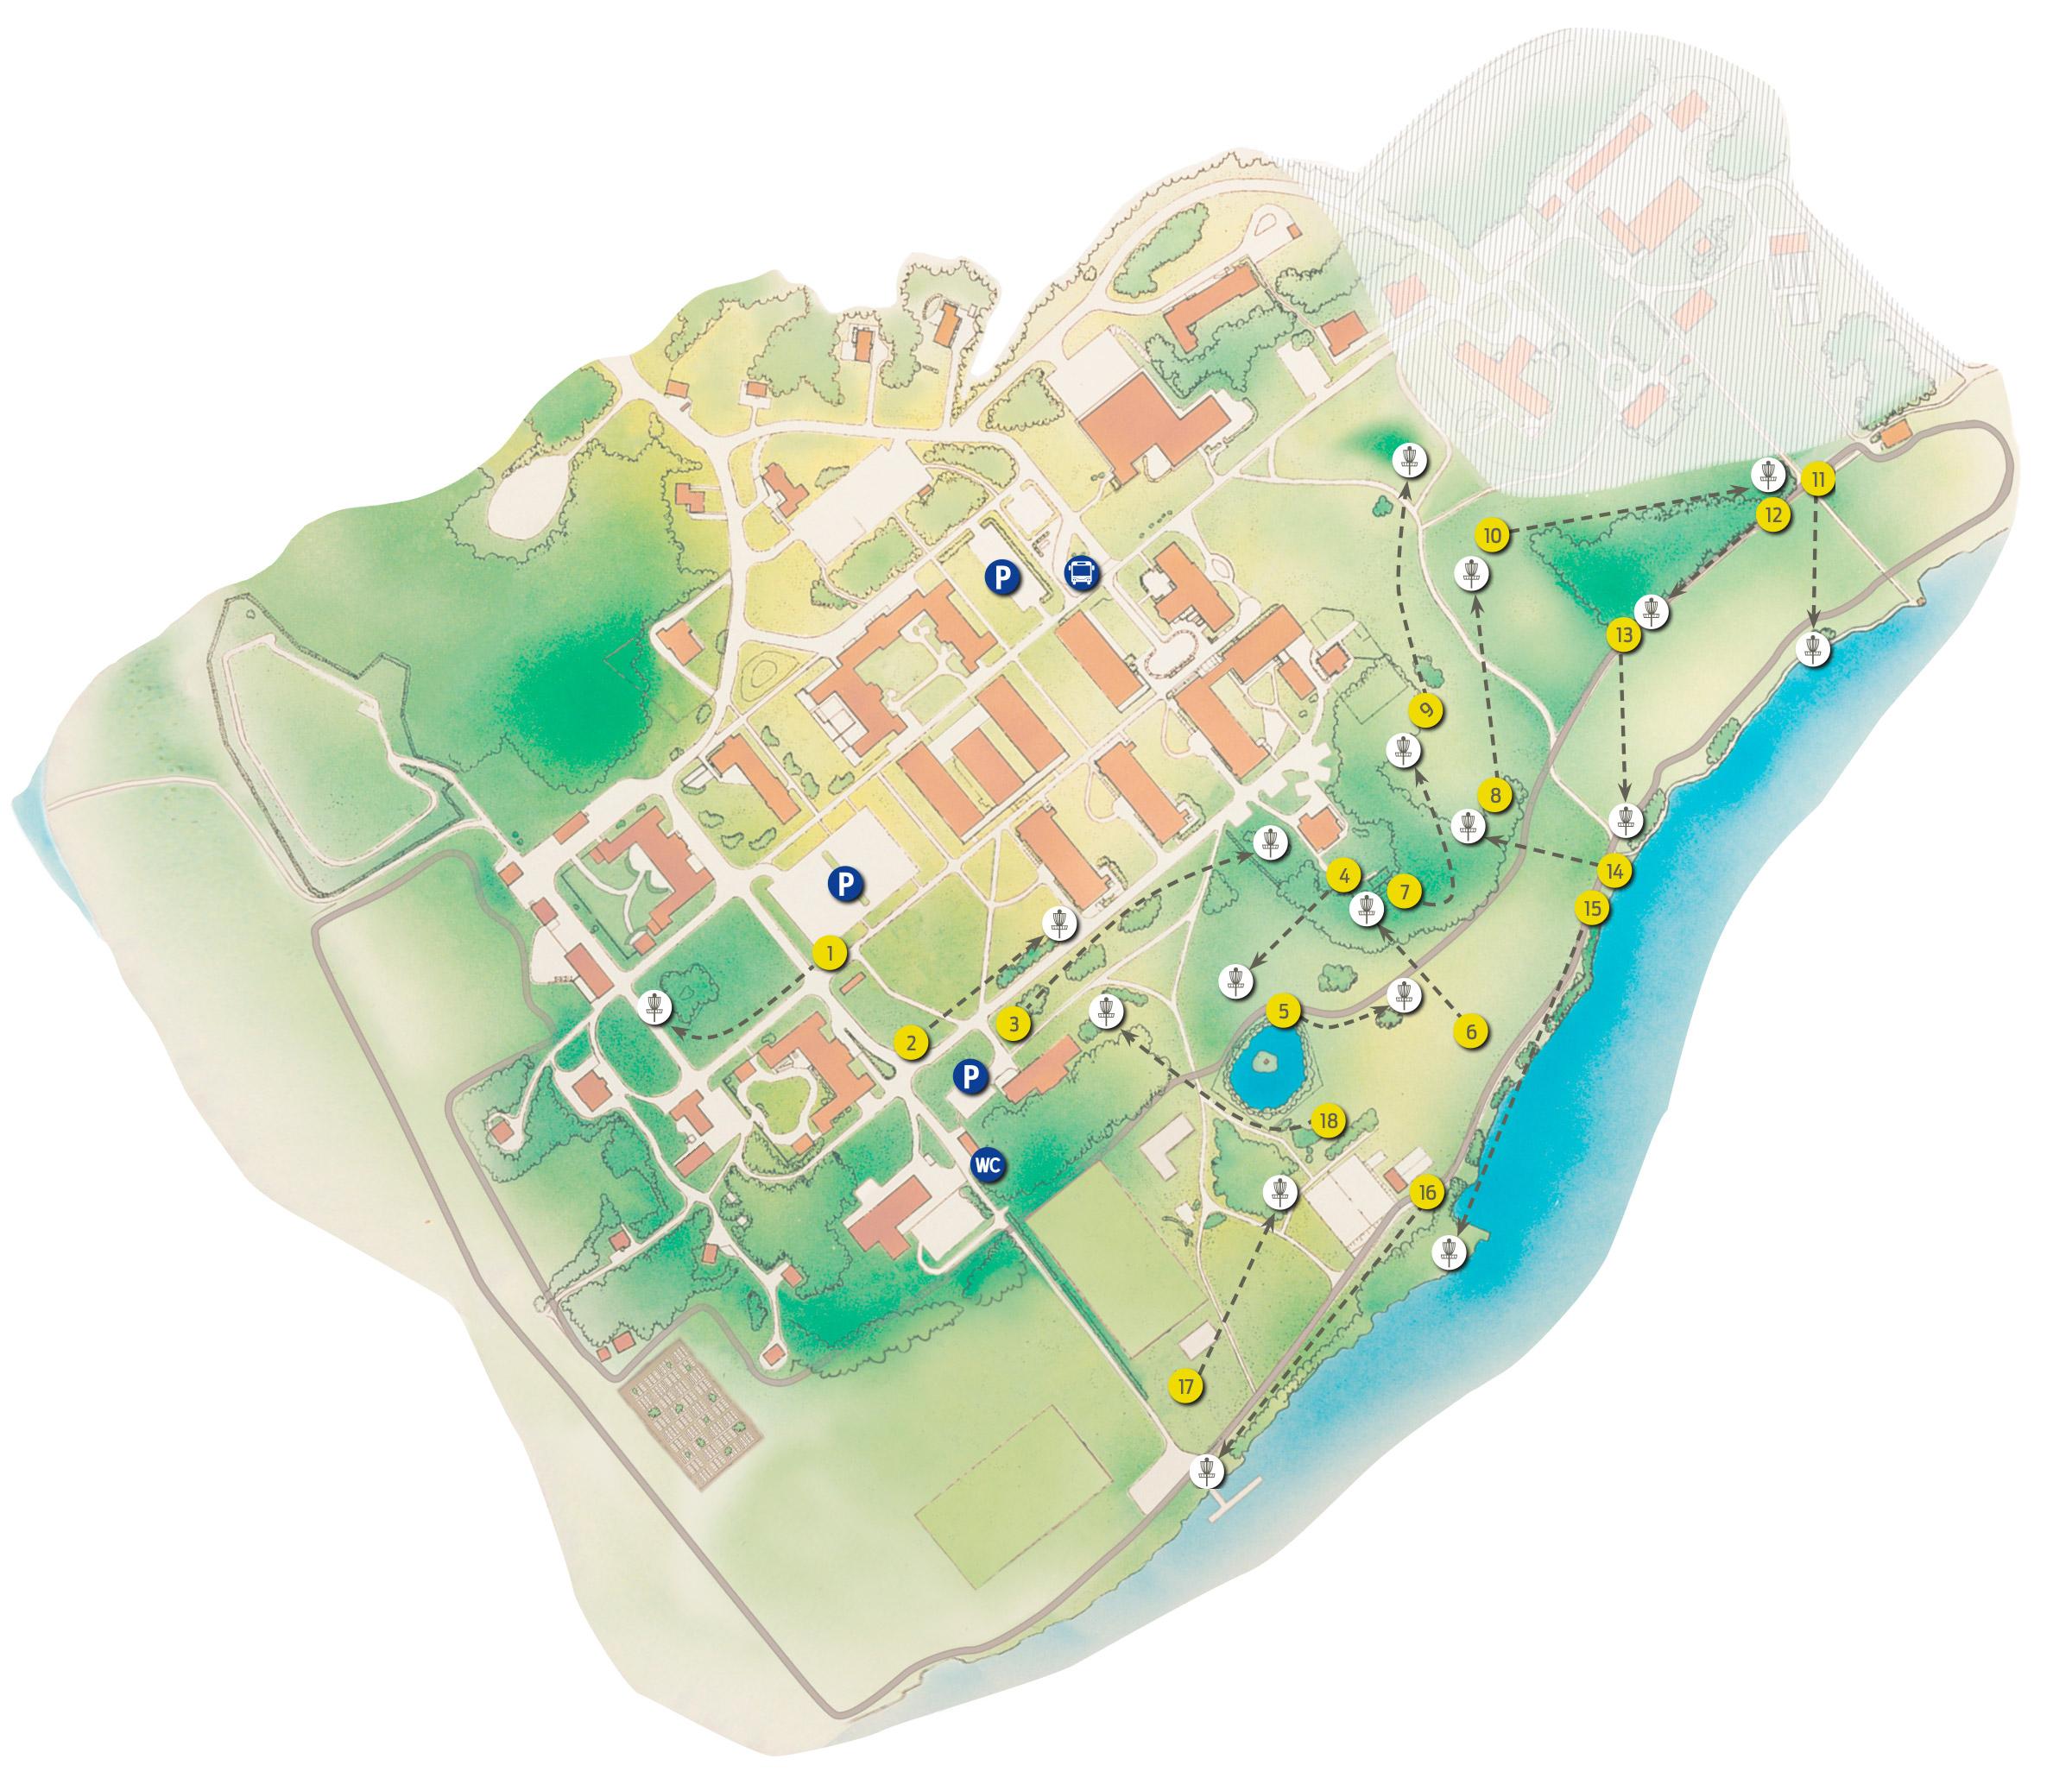 Karta over Discgolf, Restad